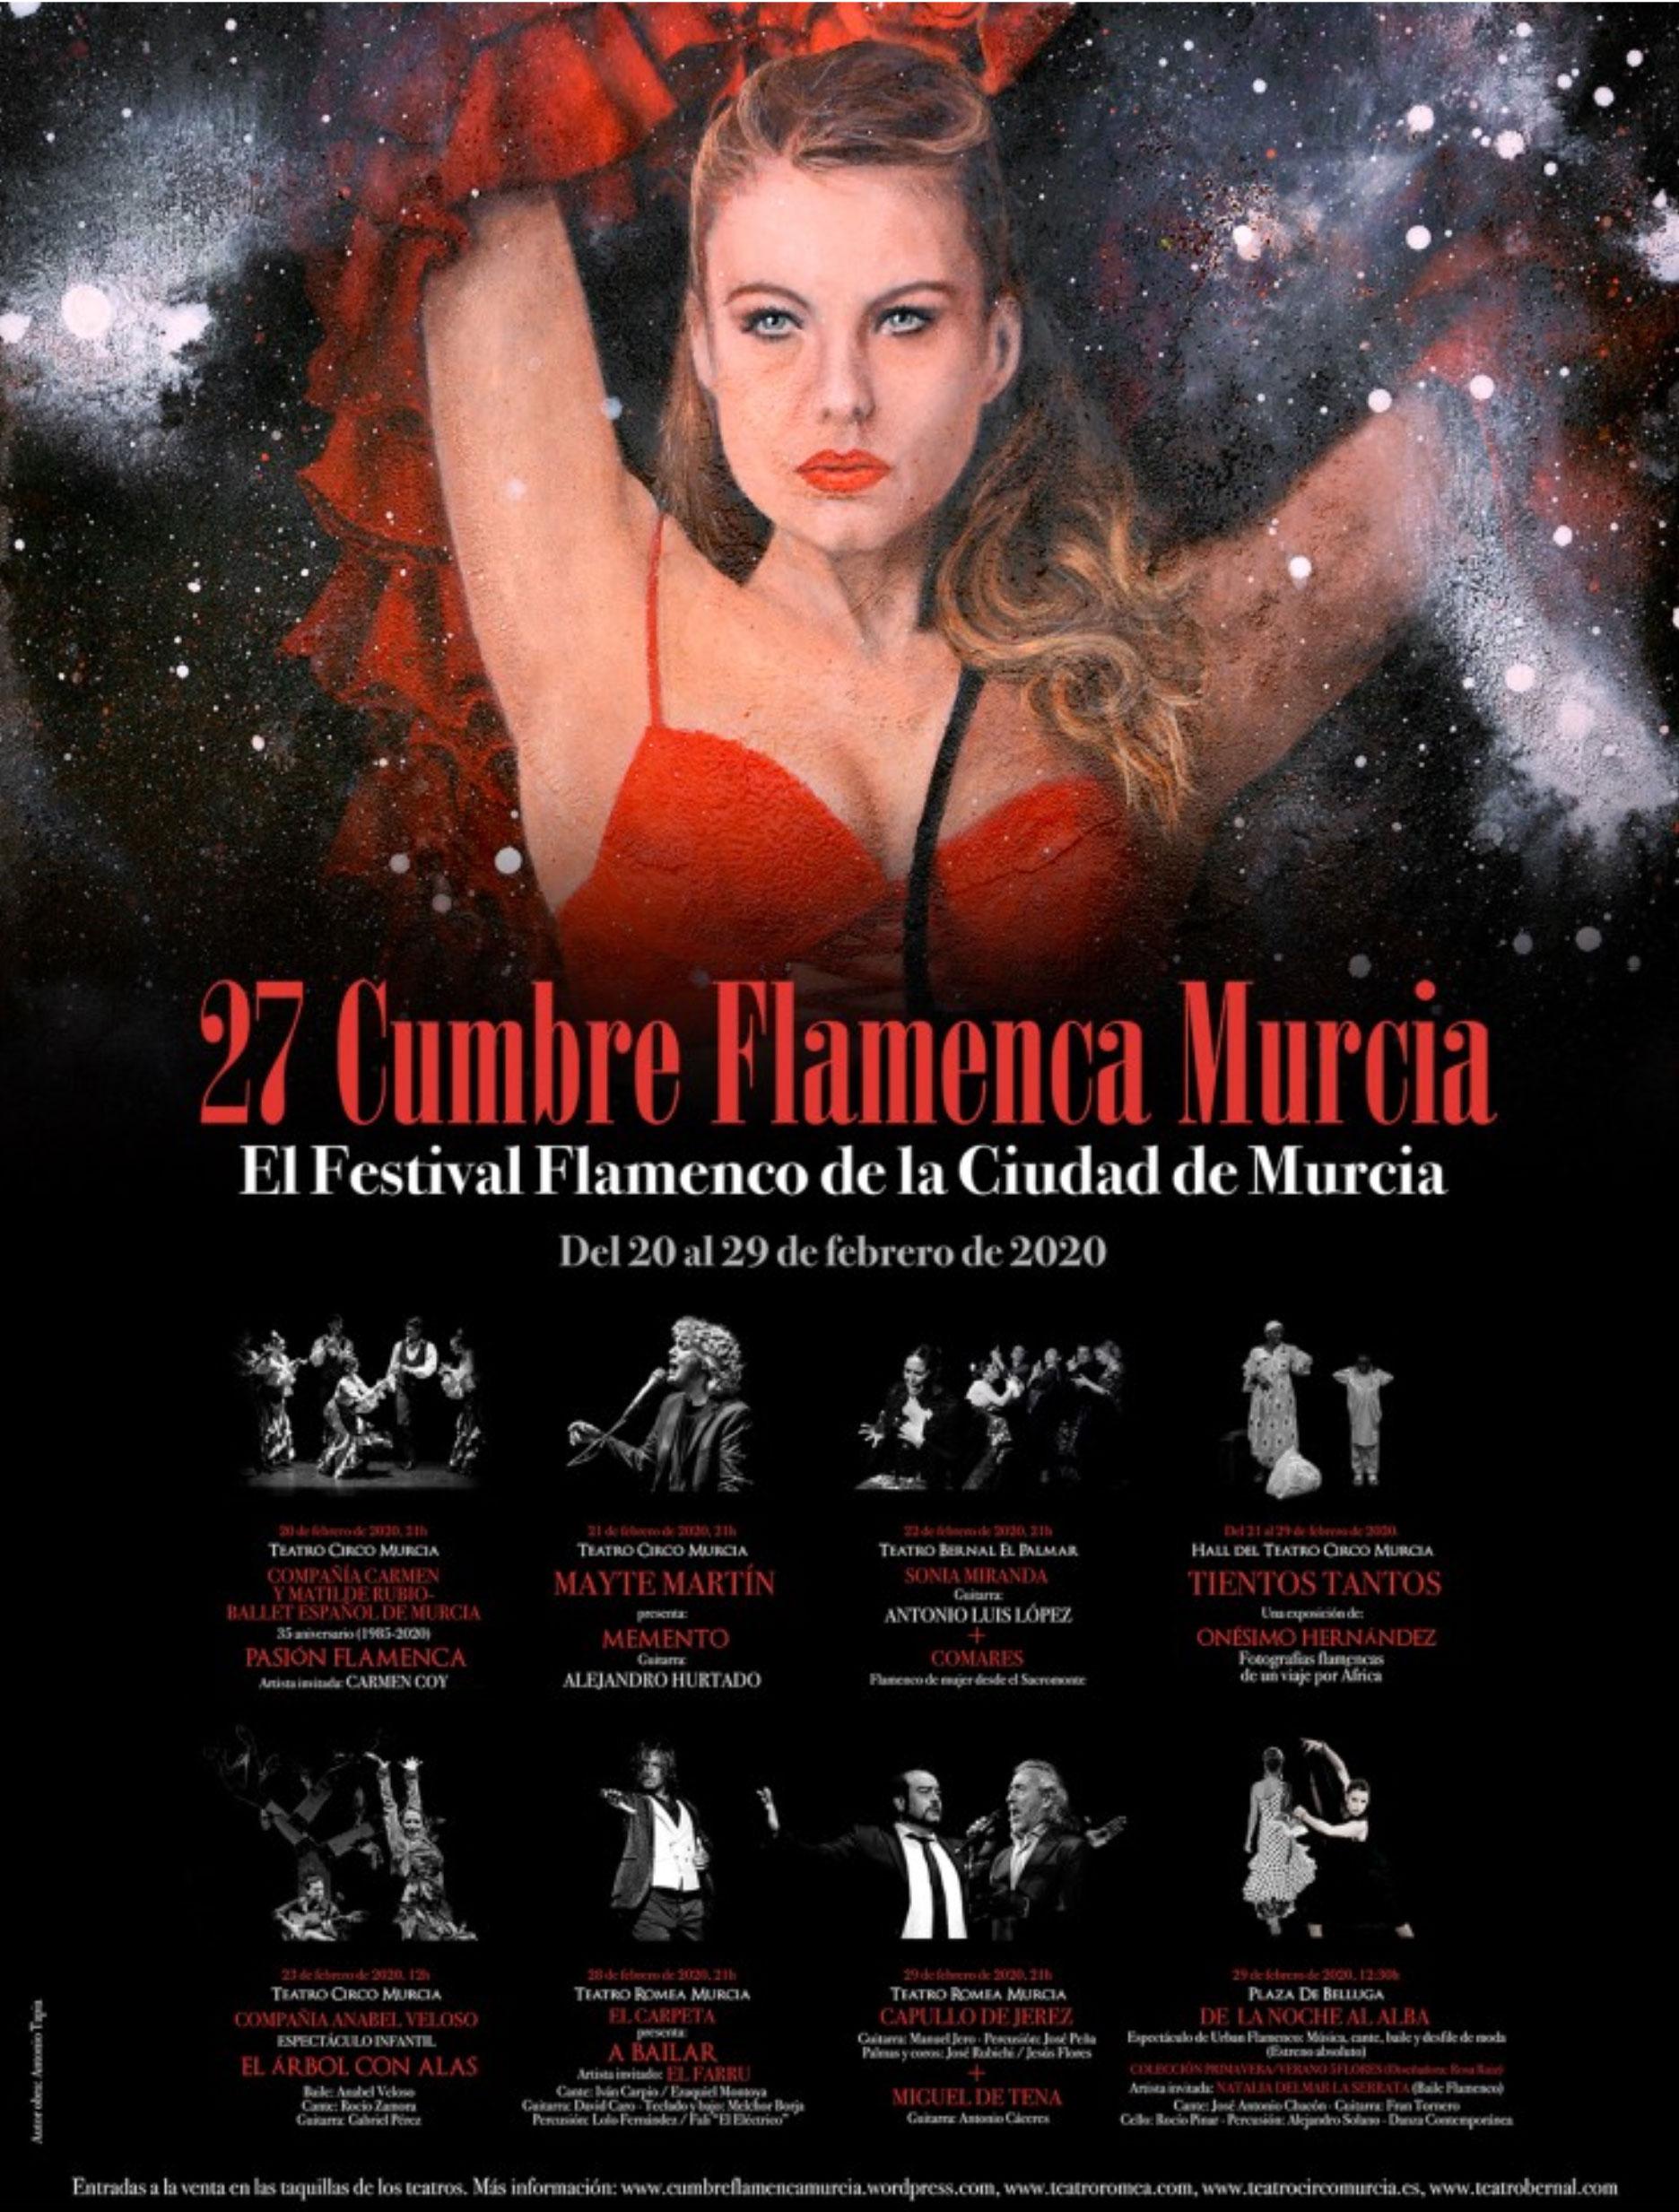 Cumbre Flamenca de Murcia 2020